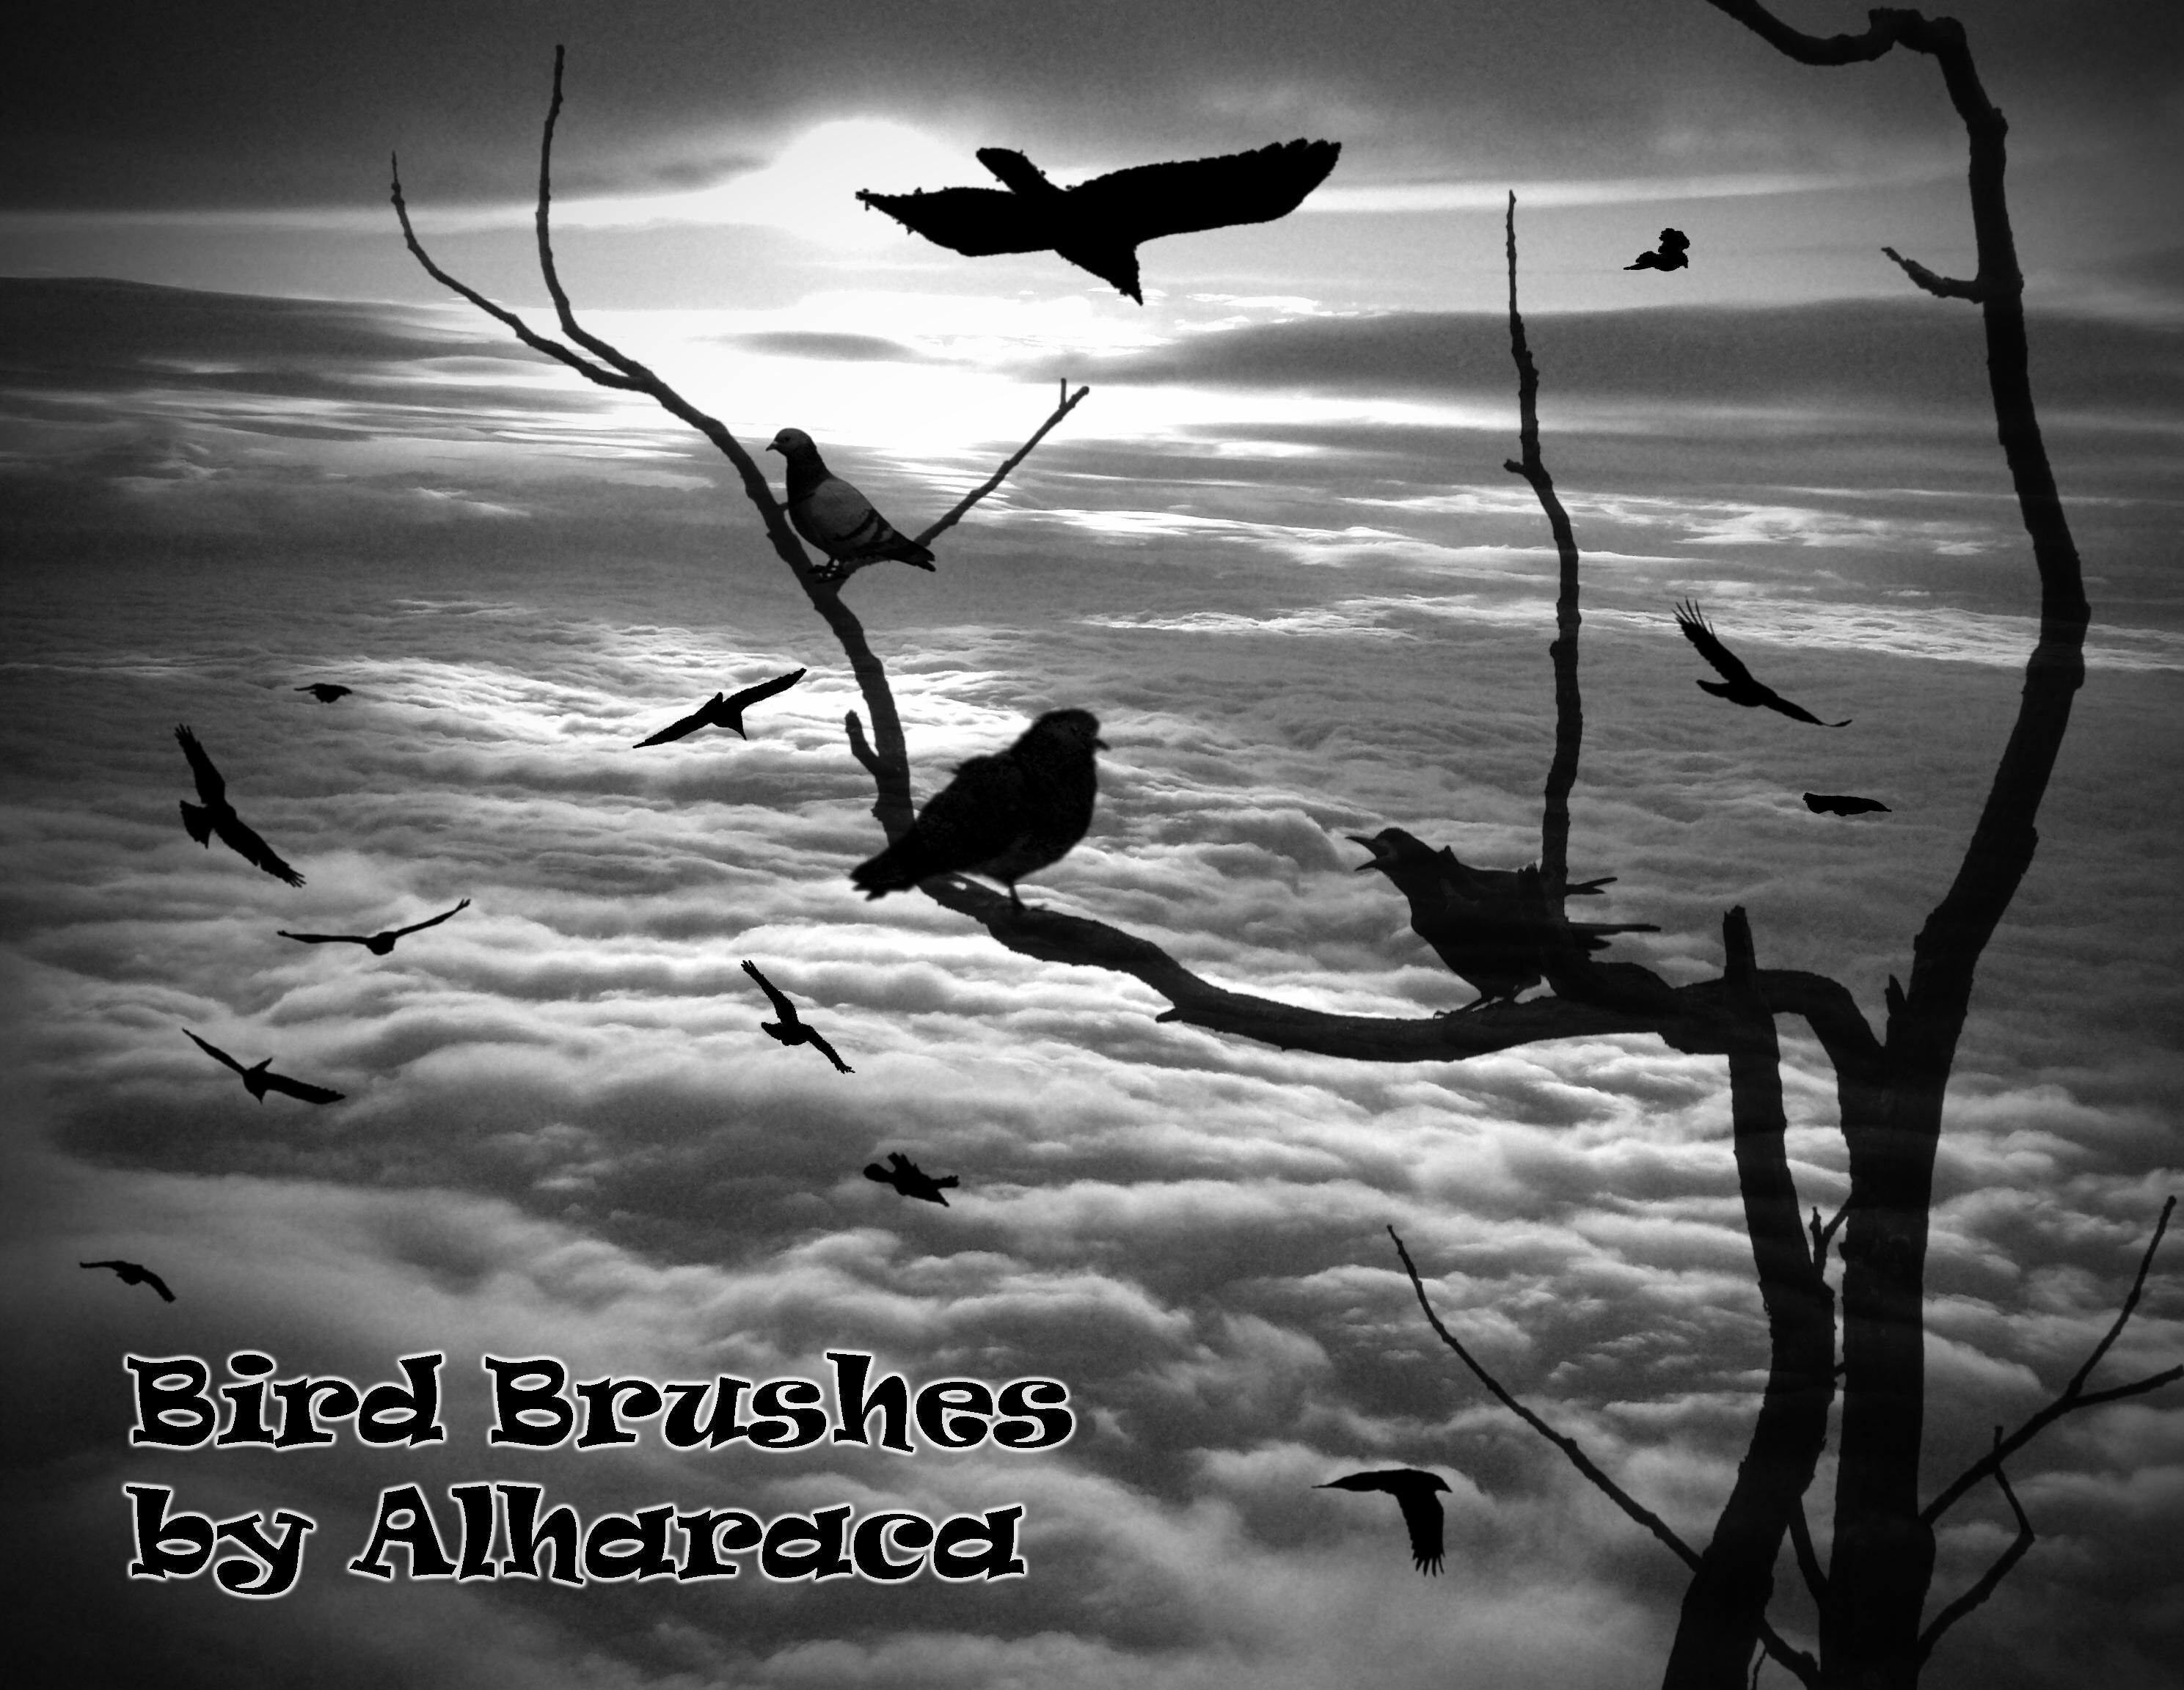 Bird Brushes 1 by Alharaca